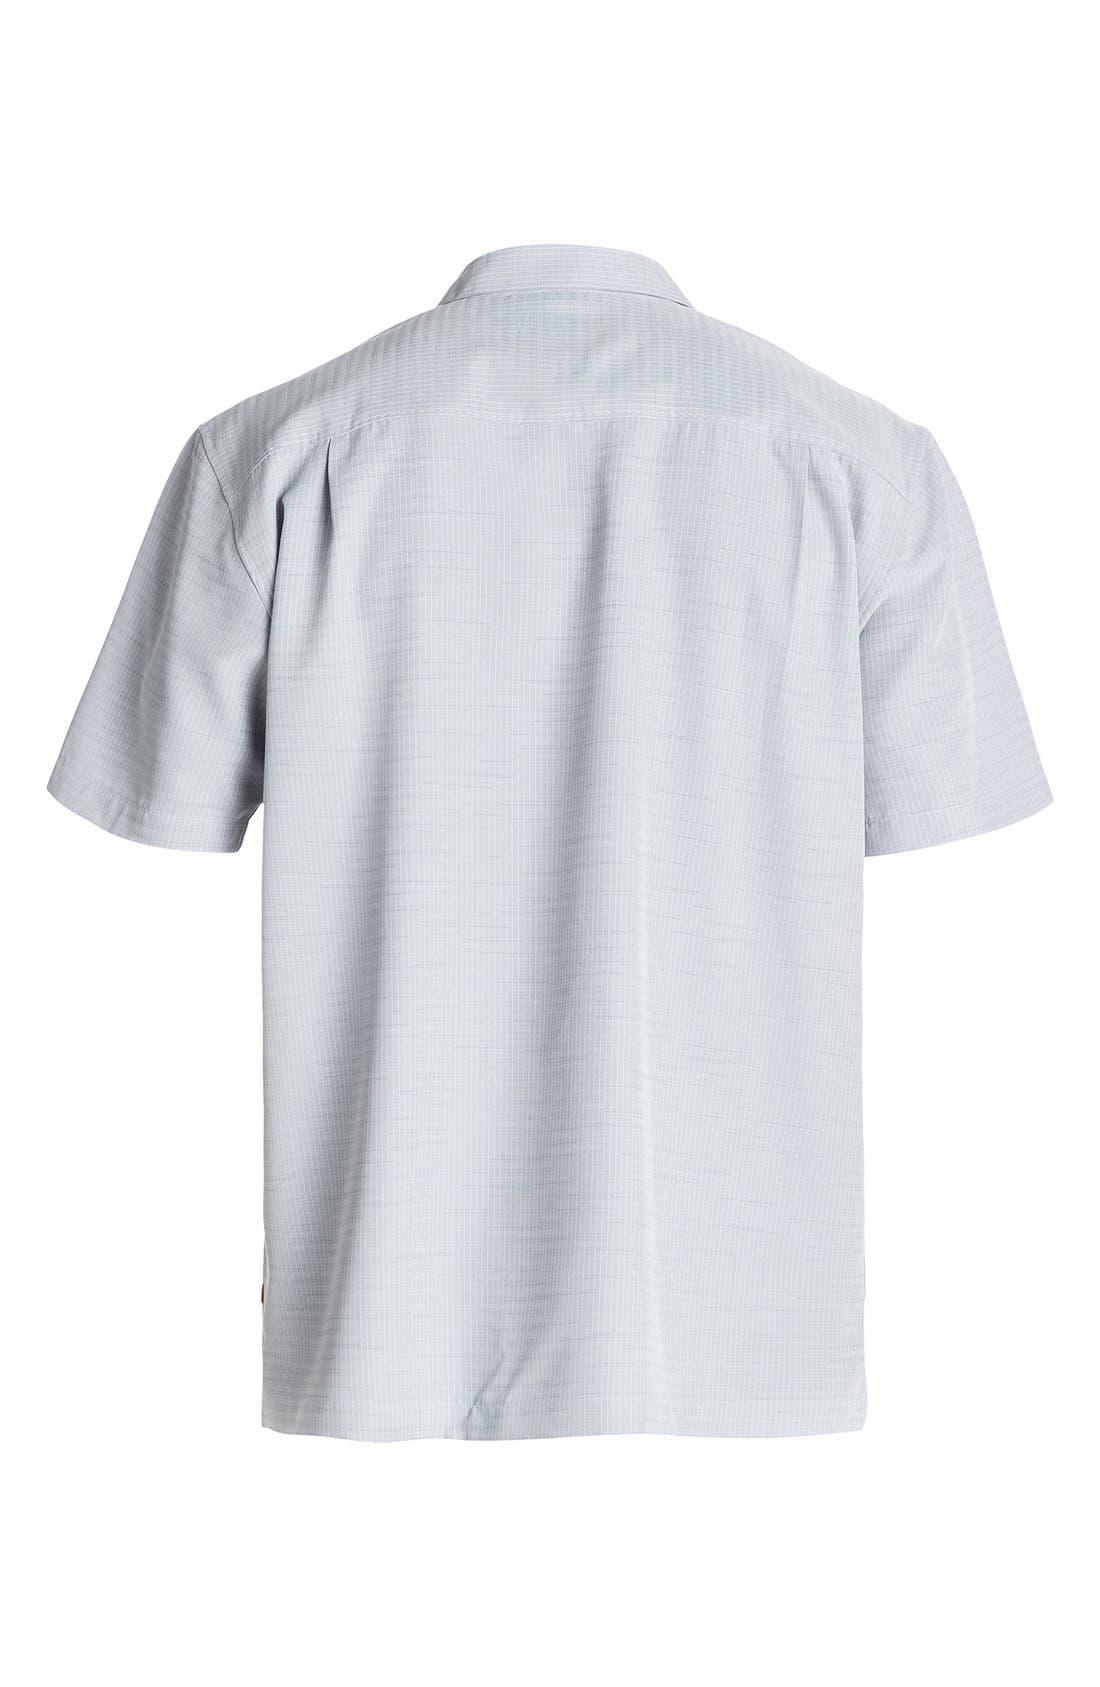 'Centinela 4' Short Sleeve Sport Shirt,                             Alternate thumbnail 44, color,